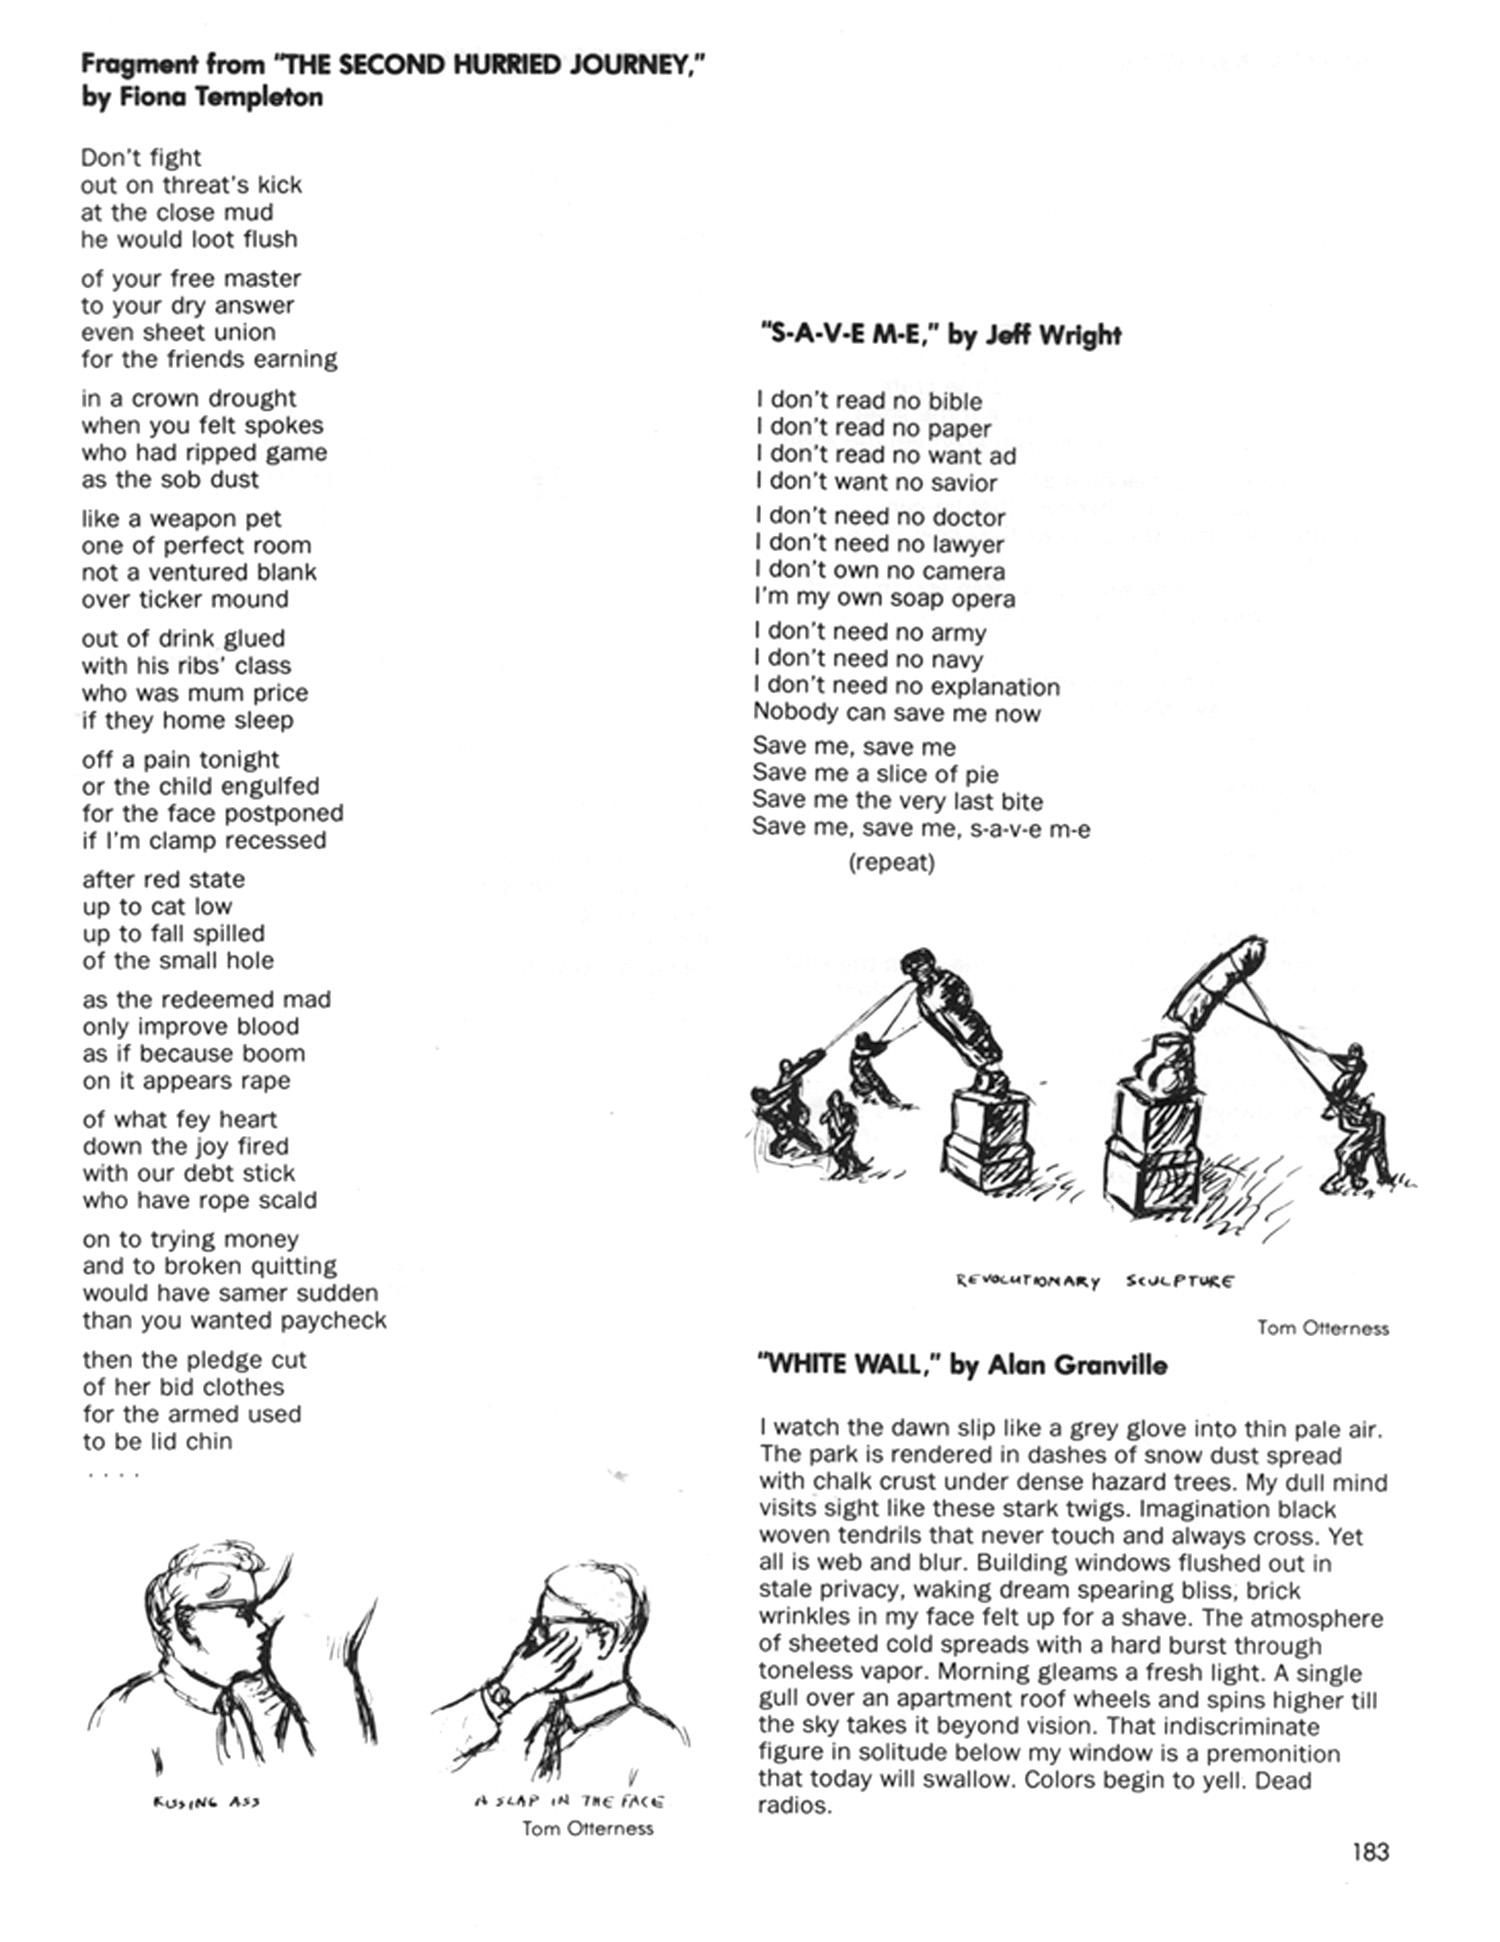 abc-no-rio-poetry-12.jpg